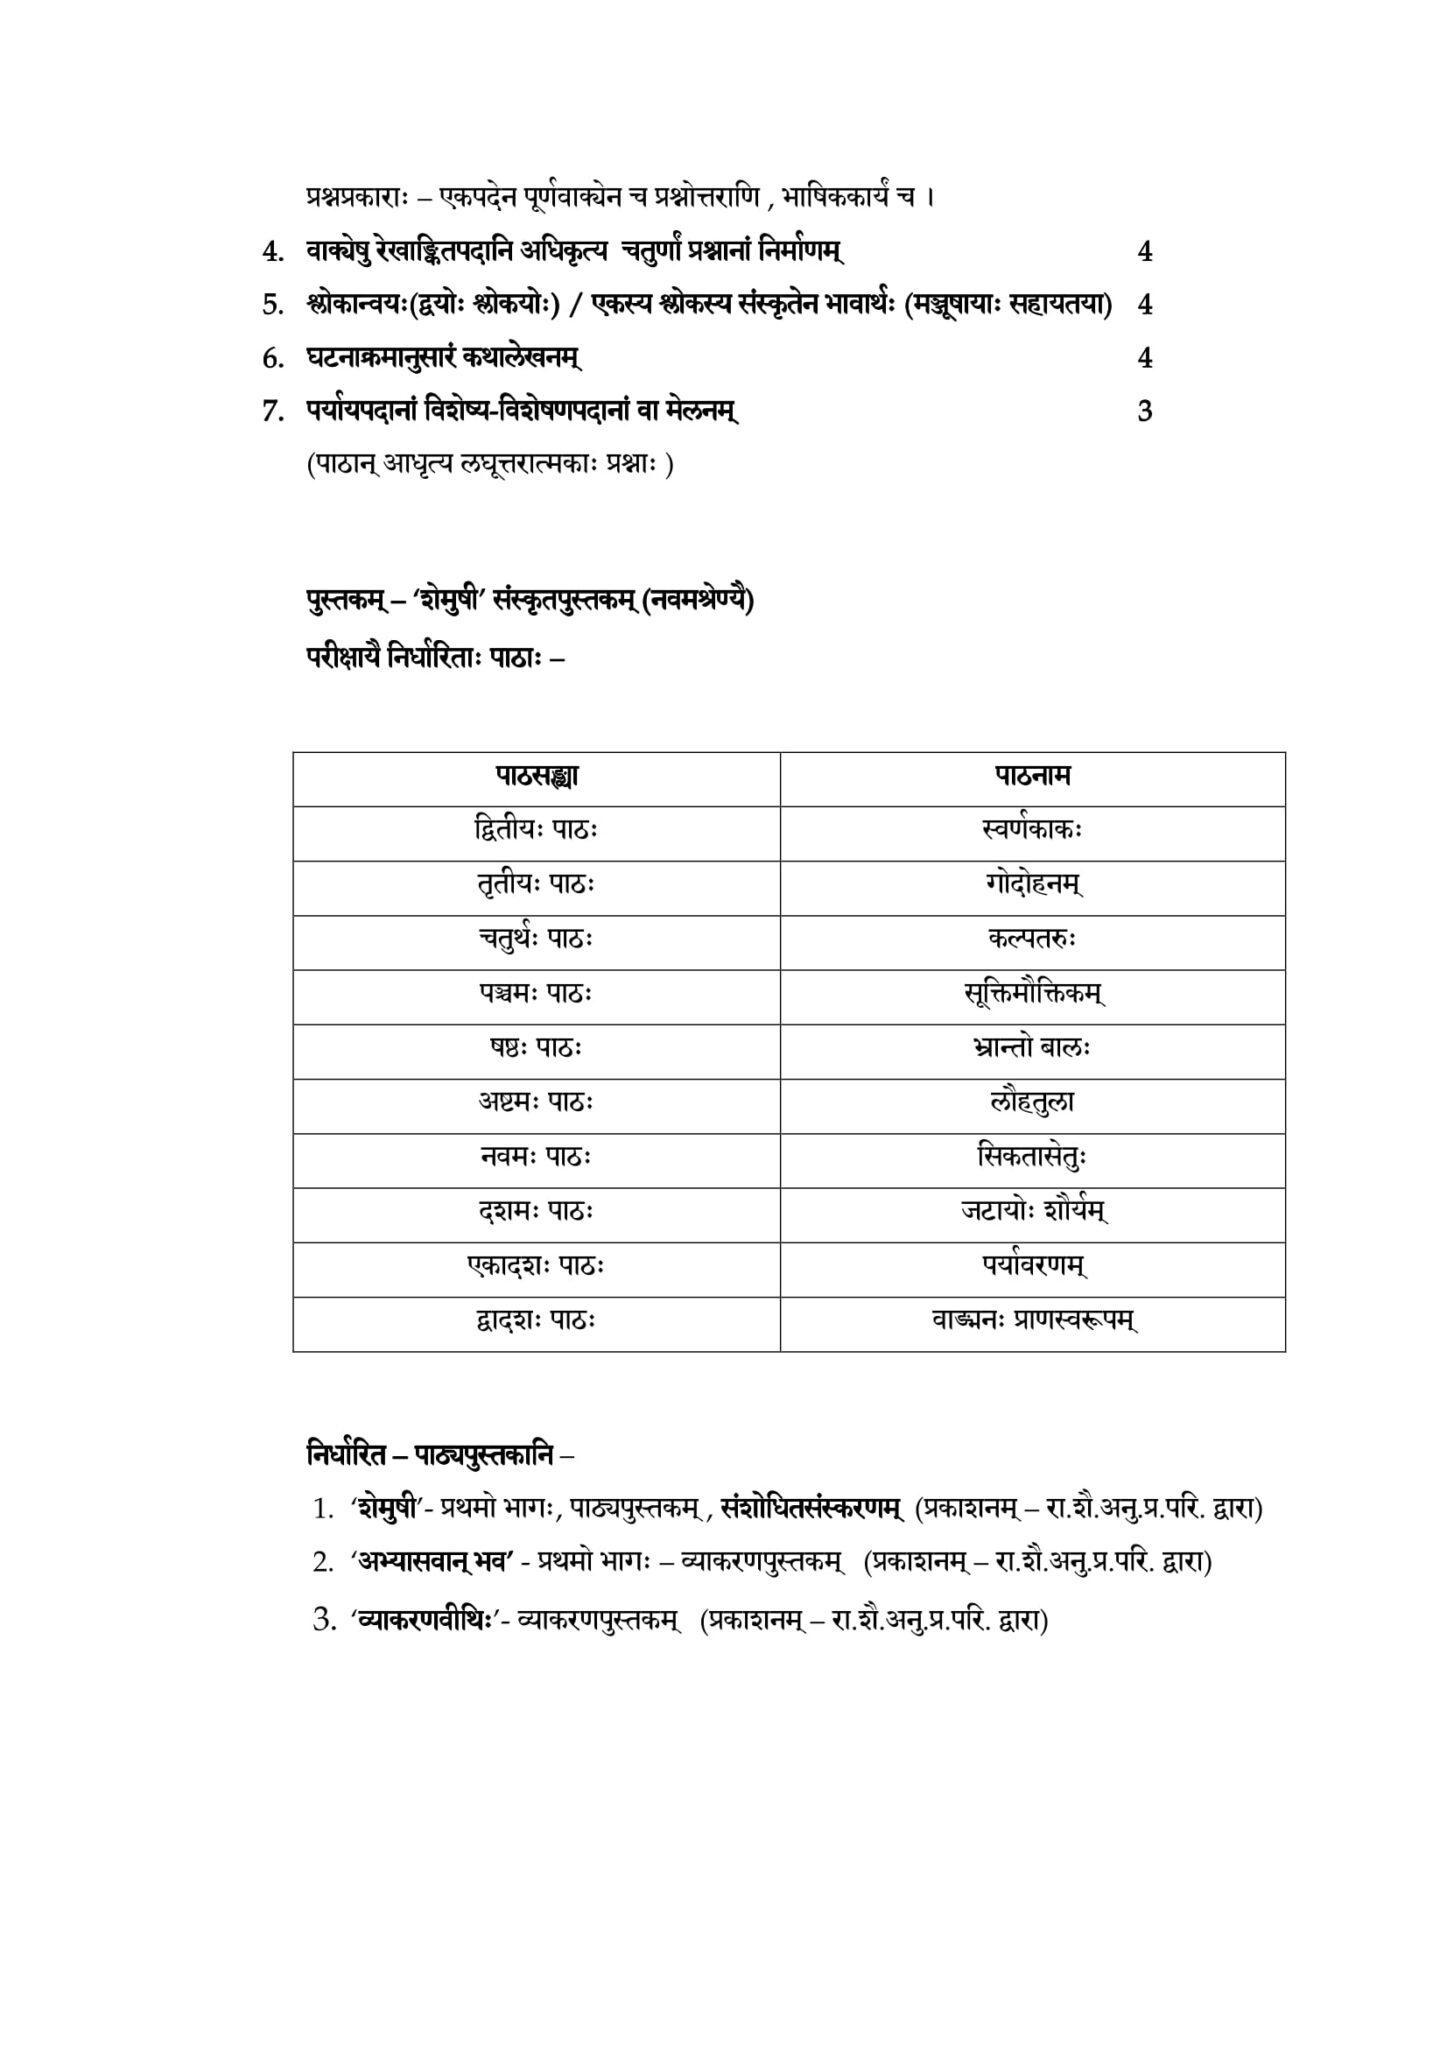 Sanskrit Sec 2020 21 class 9 10 12